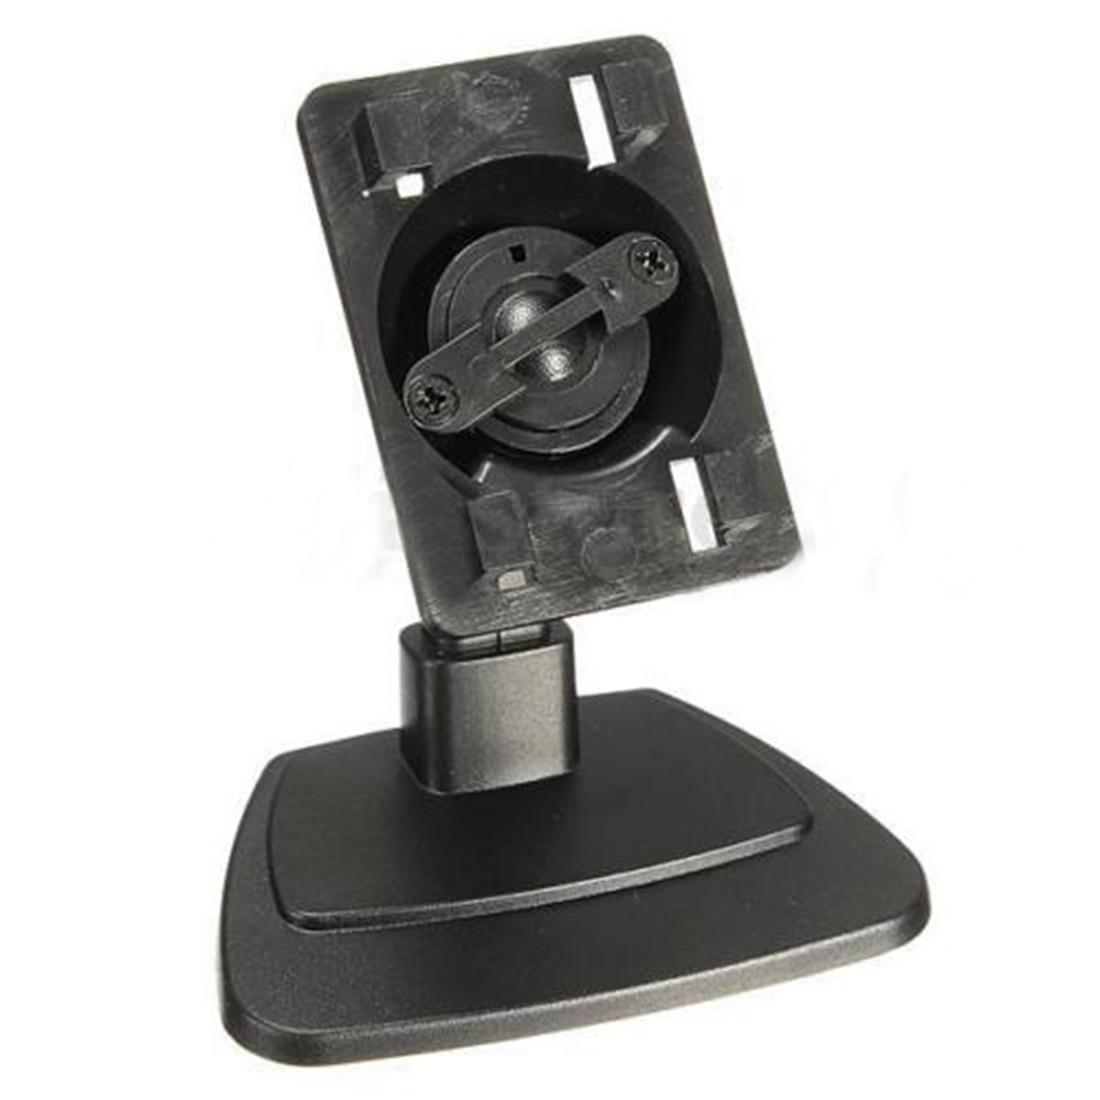 """ 800*480 TFT lcd HD экран монитор для автомобиля заднего вида резервная камера"